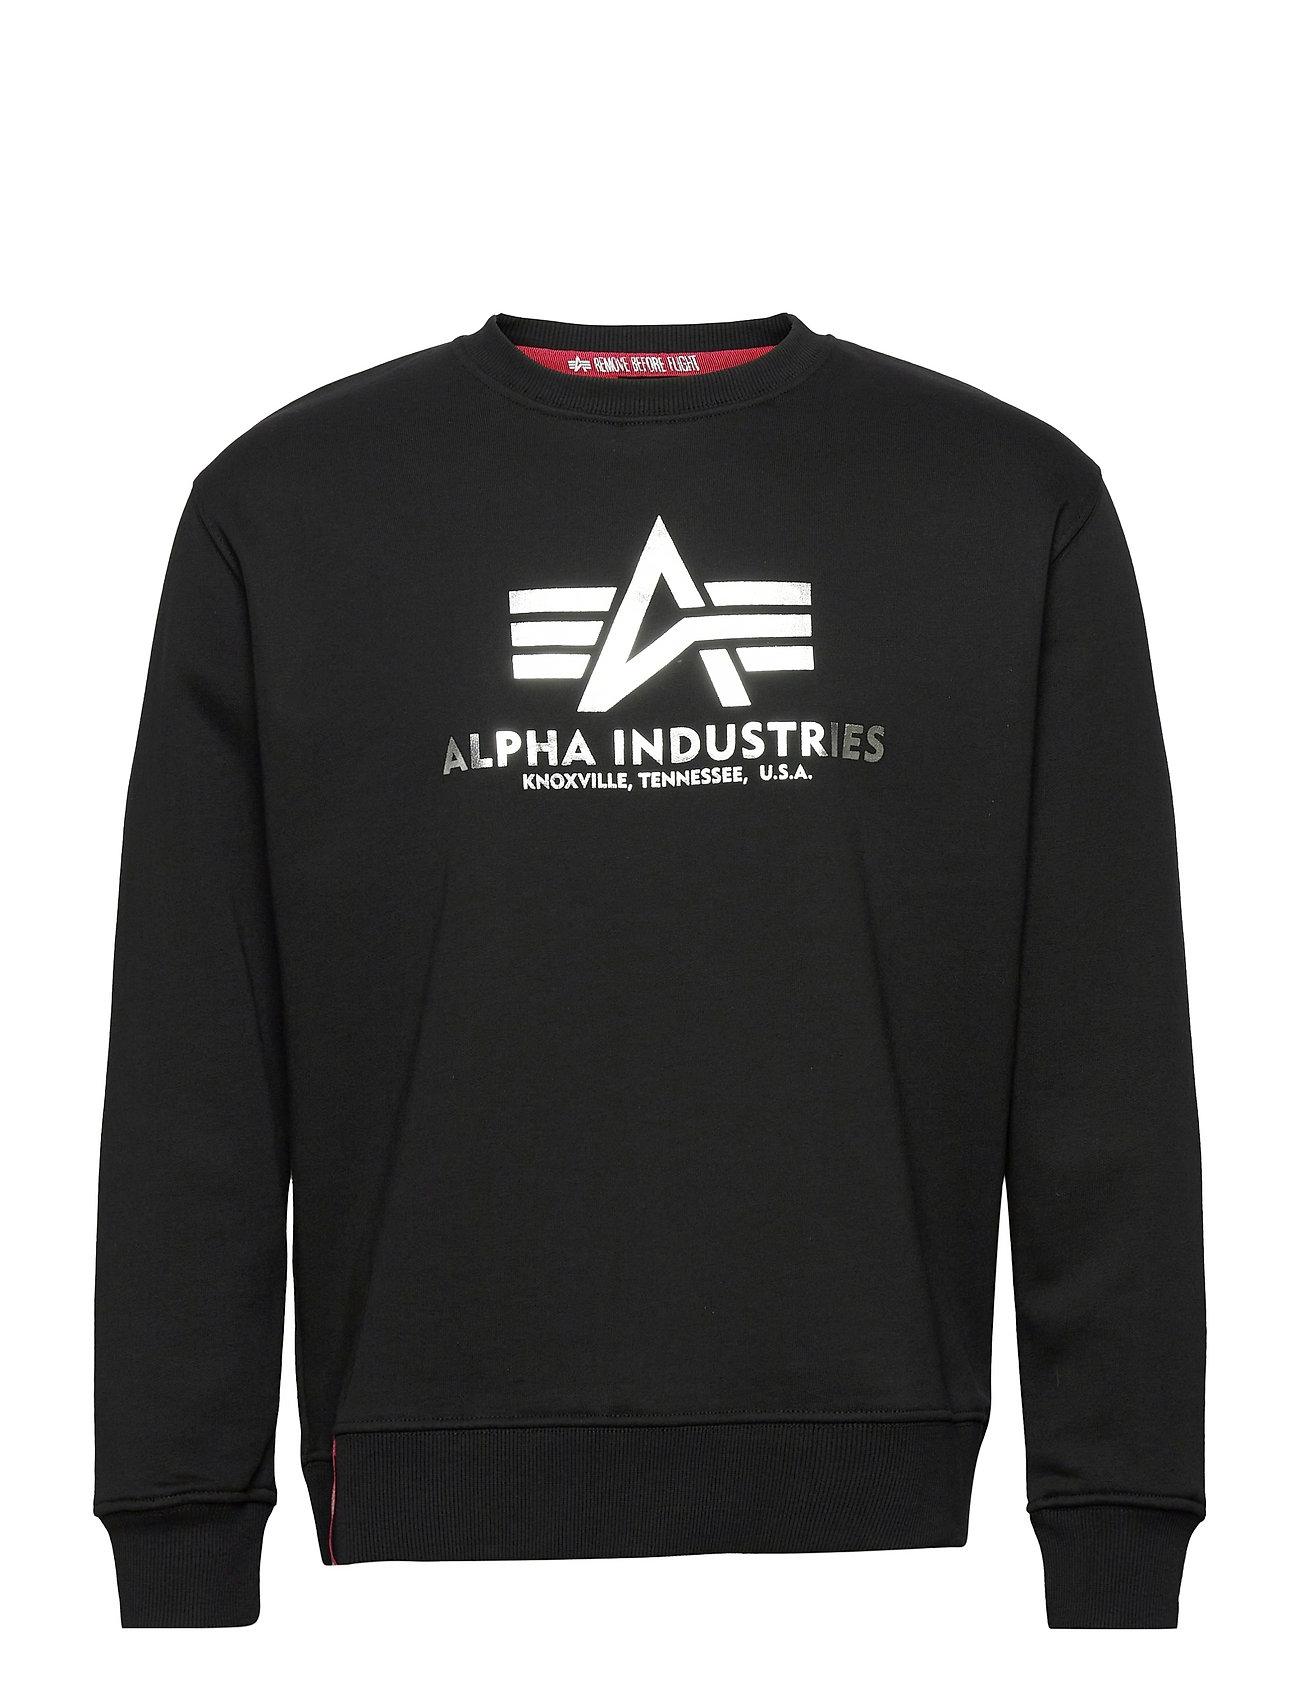 Basic Sweater Foil Print Sweatshirt Trøje Sort Alpha Industries